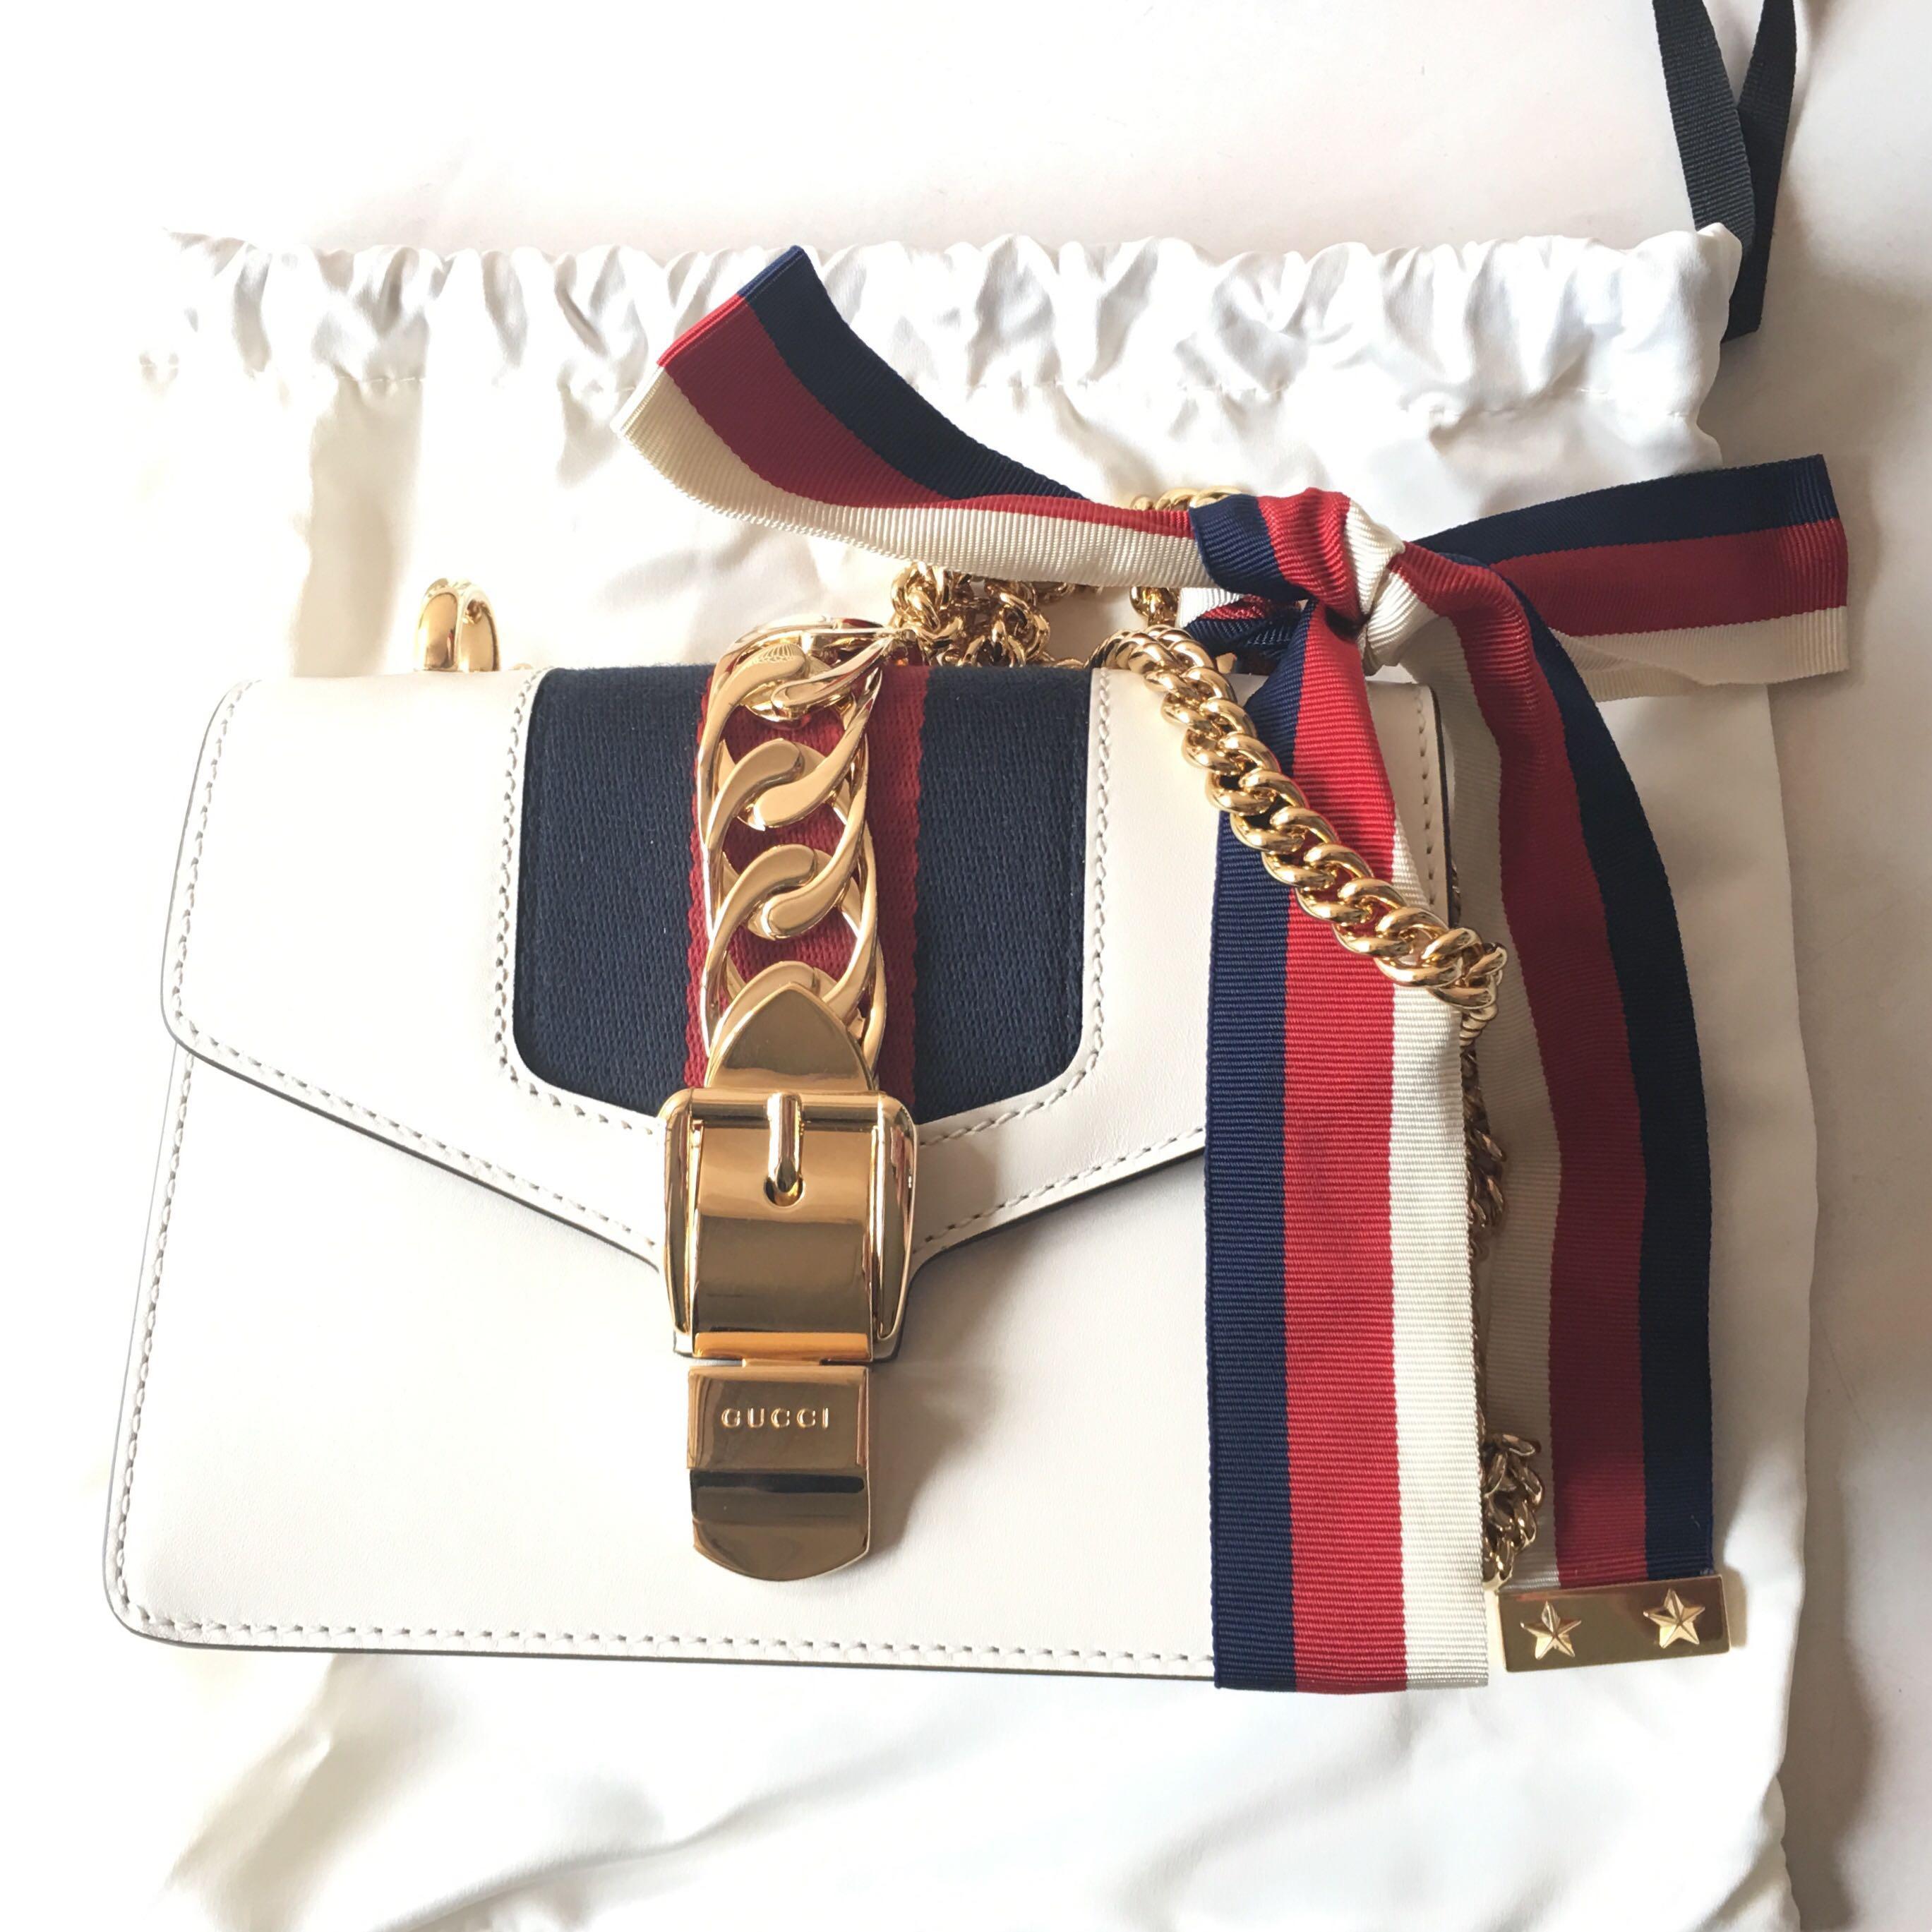 e7659b7e65 Gucci Sylvie Leather Mini Chain Bag, Women's Fashion, Bags & Wallets ...